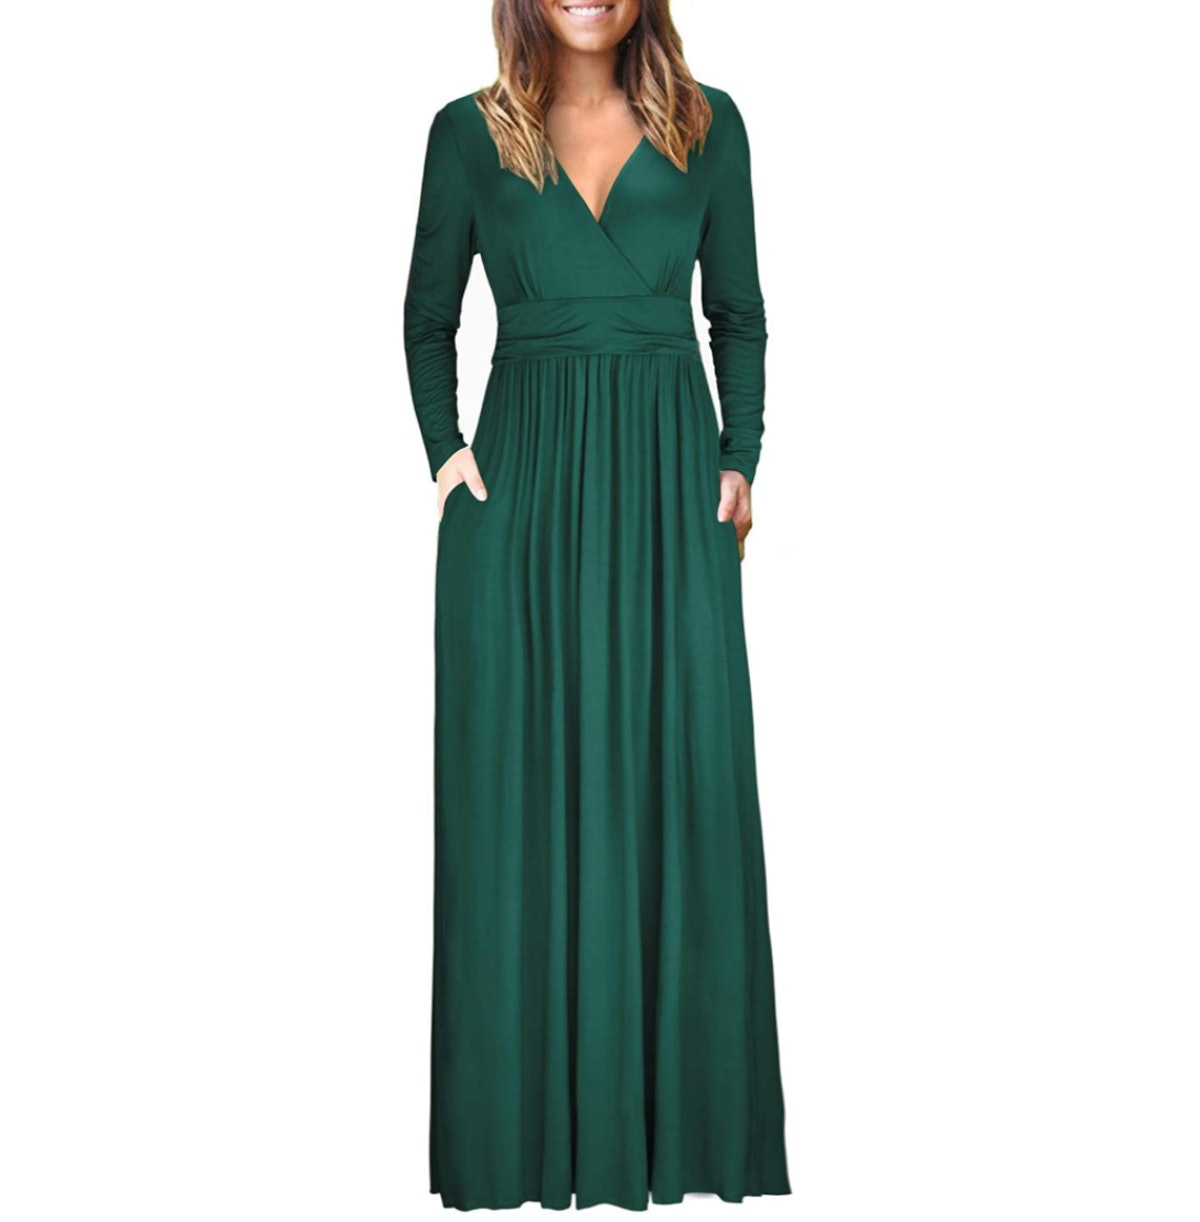 OUGES Long Sleeve Maxi Dress